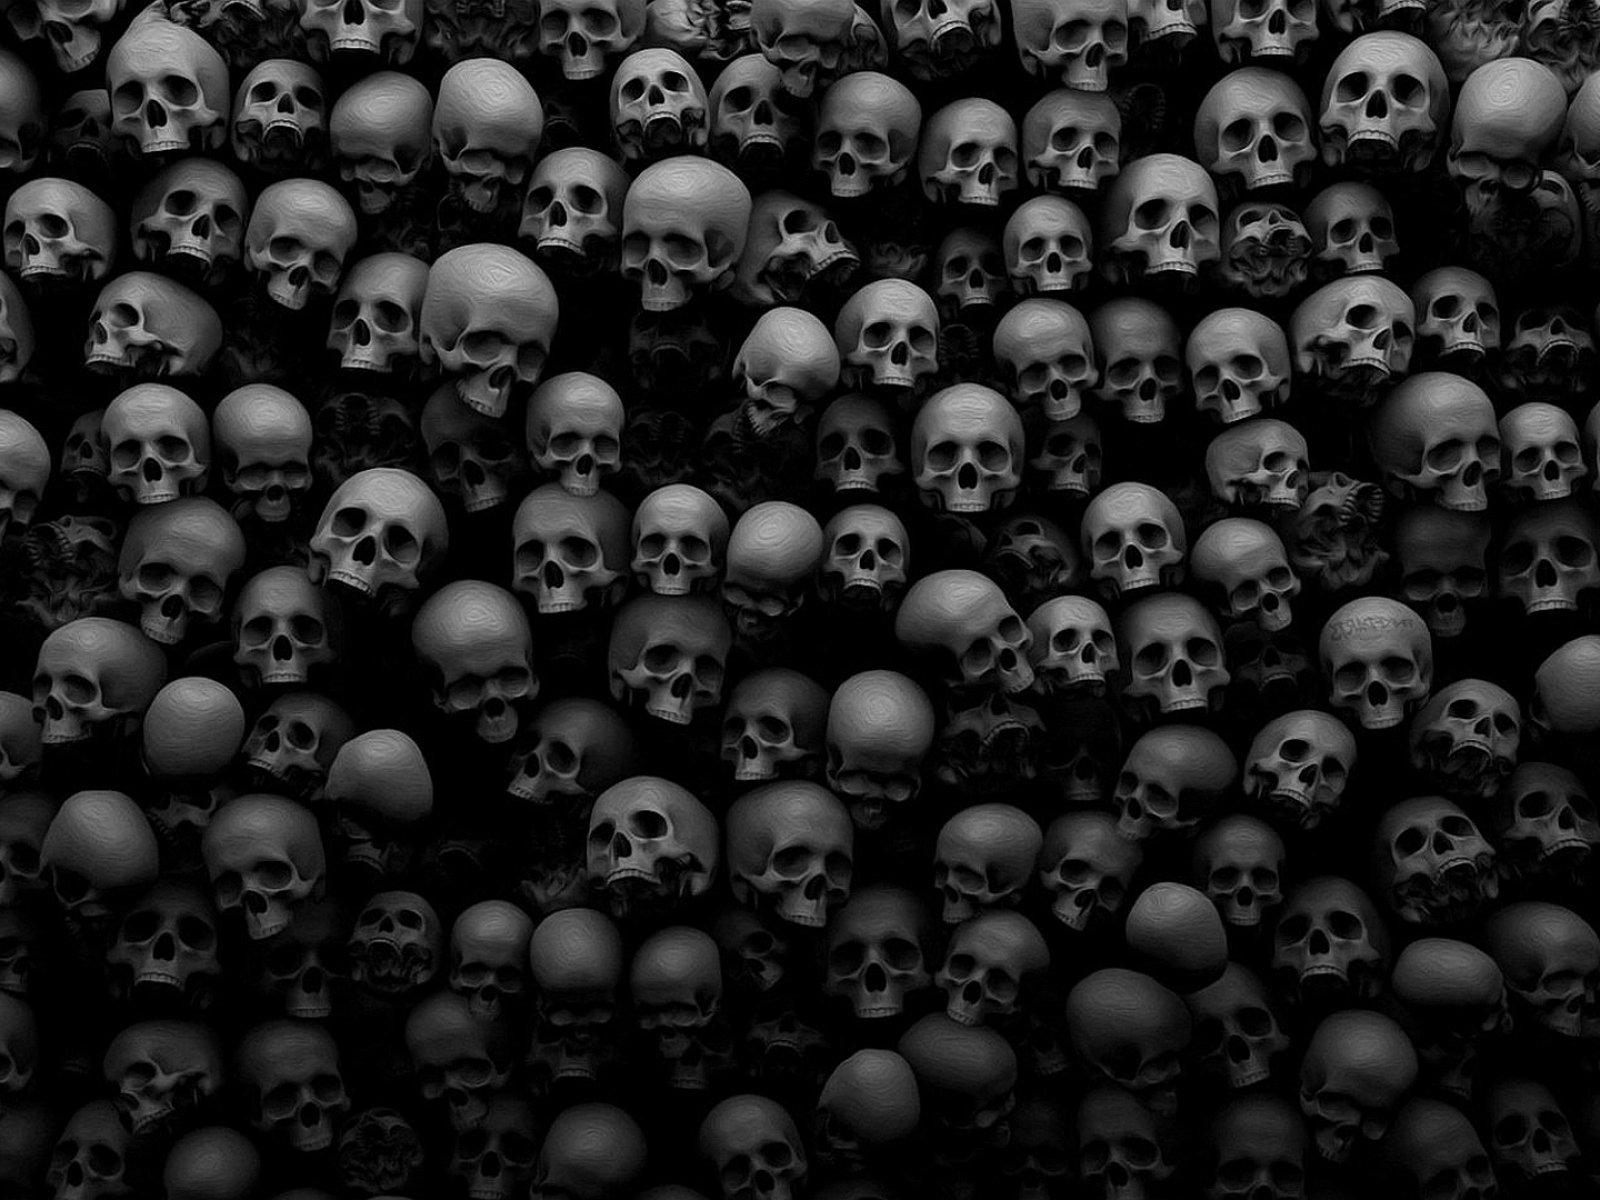 dark art artwork fantasy artistic original horror evil creepy scary spooky halloween 311